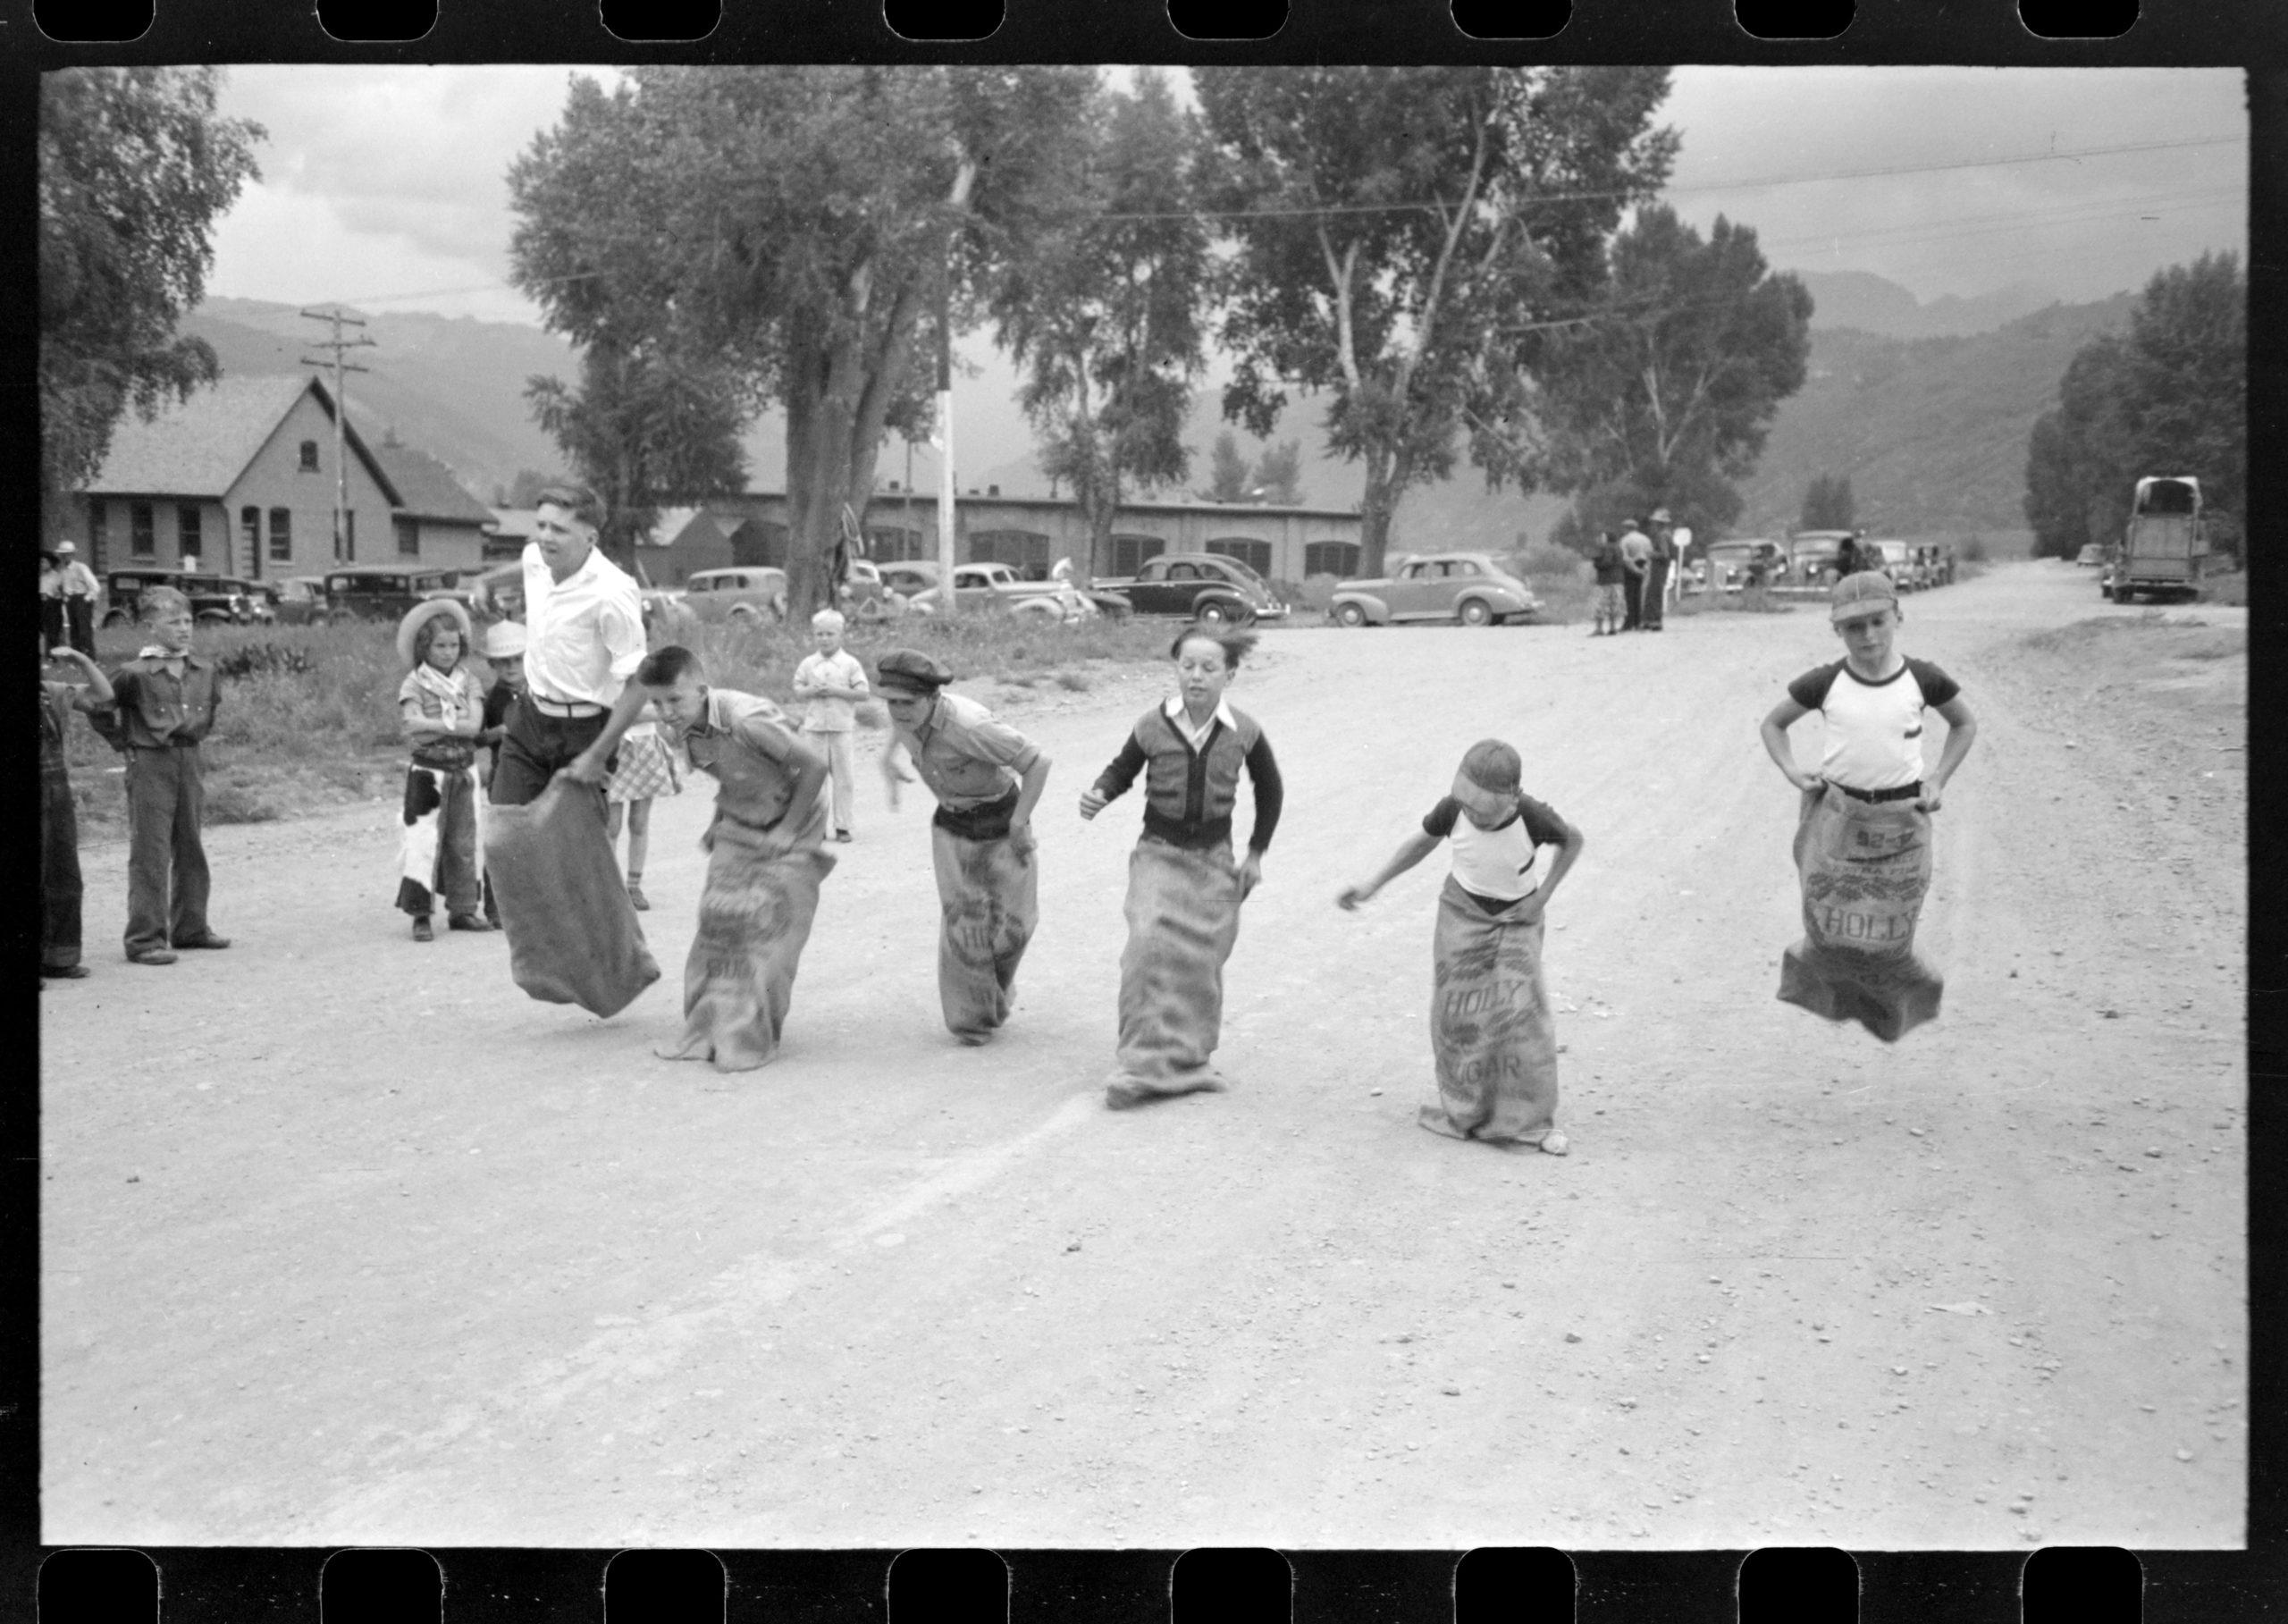 Labor Day celebration in Colorado, circa 1940. Library of Congress